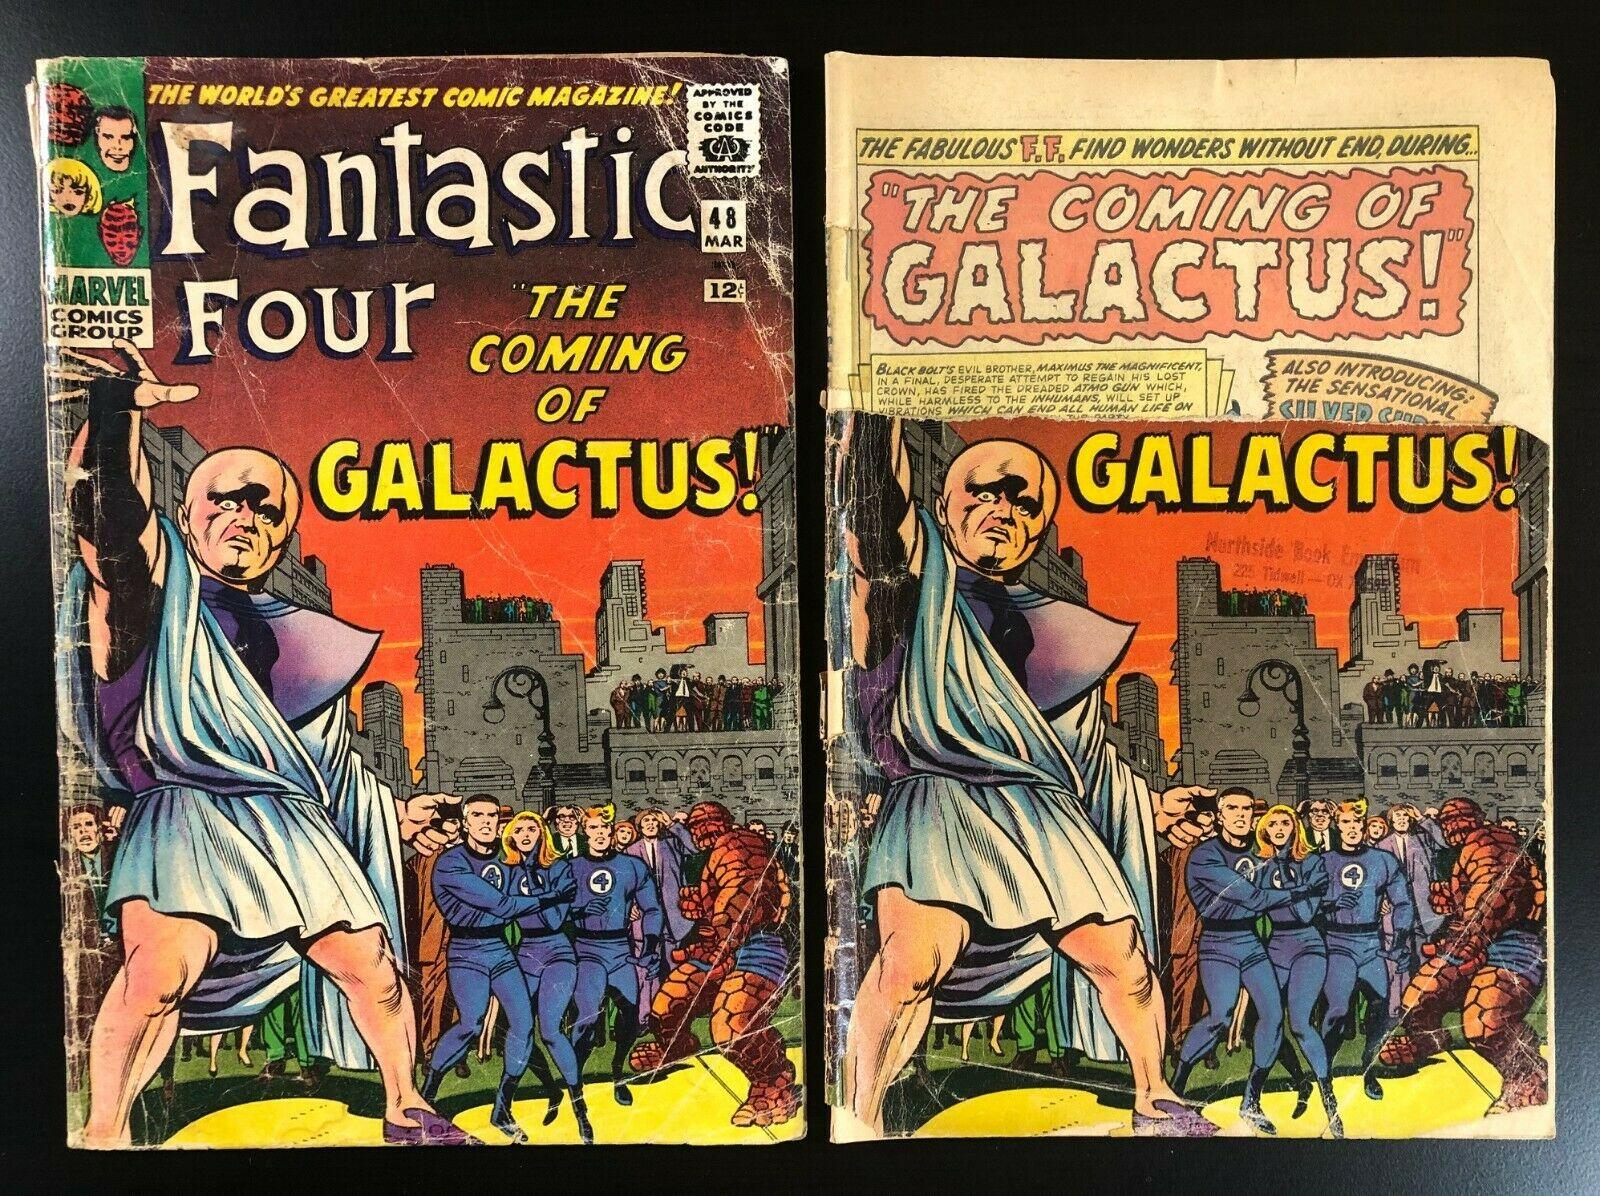 Fantastic Four 48  4?? *2 COPIES* 0.5 & 1.0 1st Galactus & Silver Surfer 1966